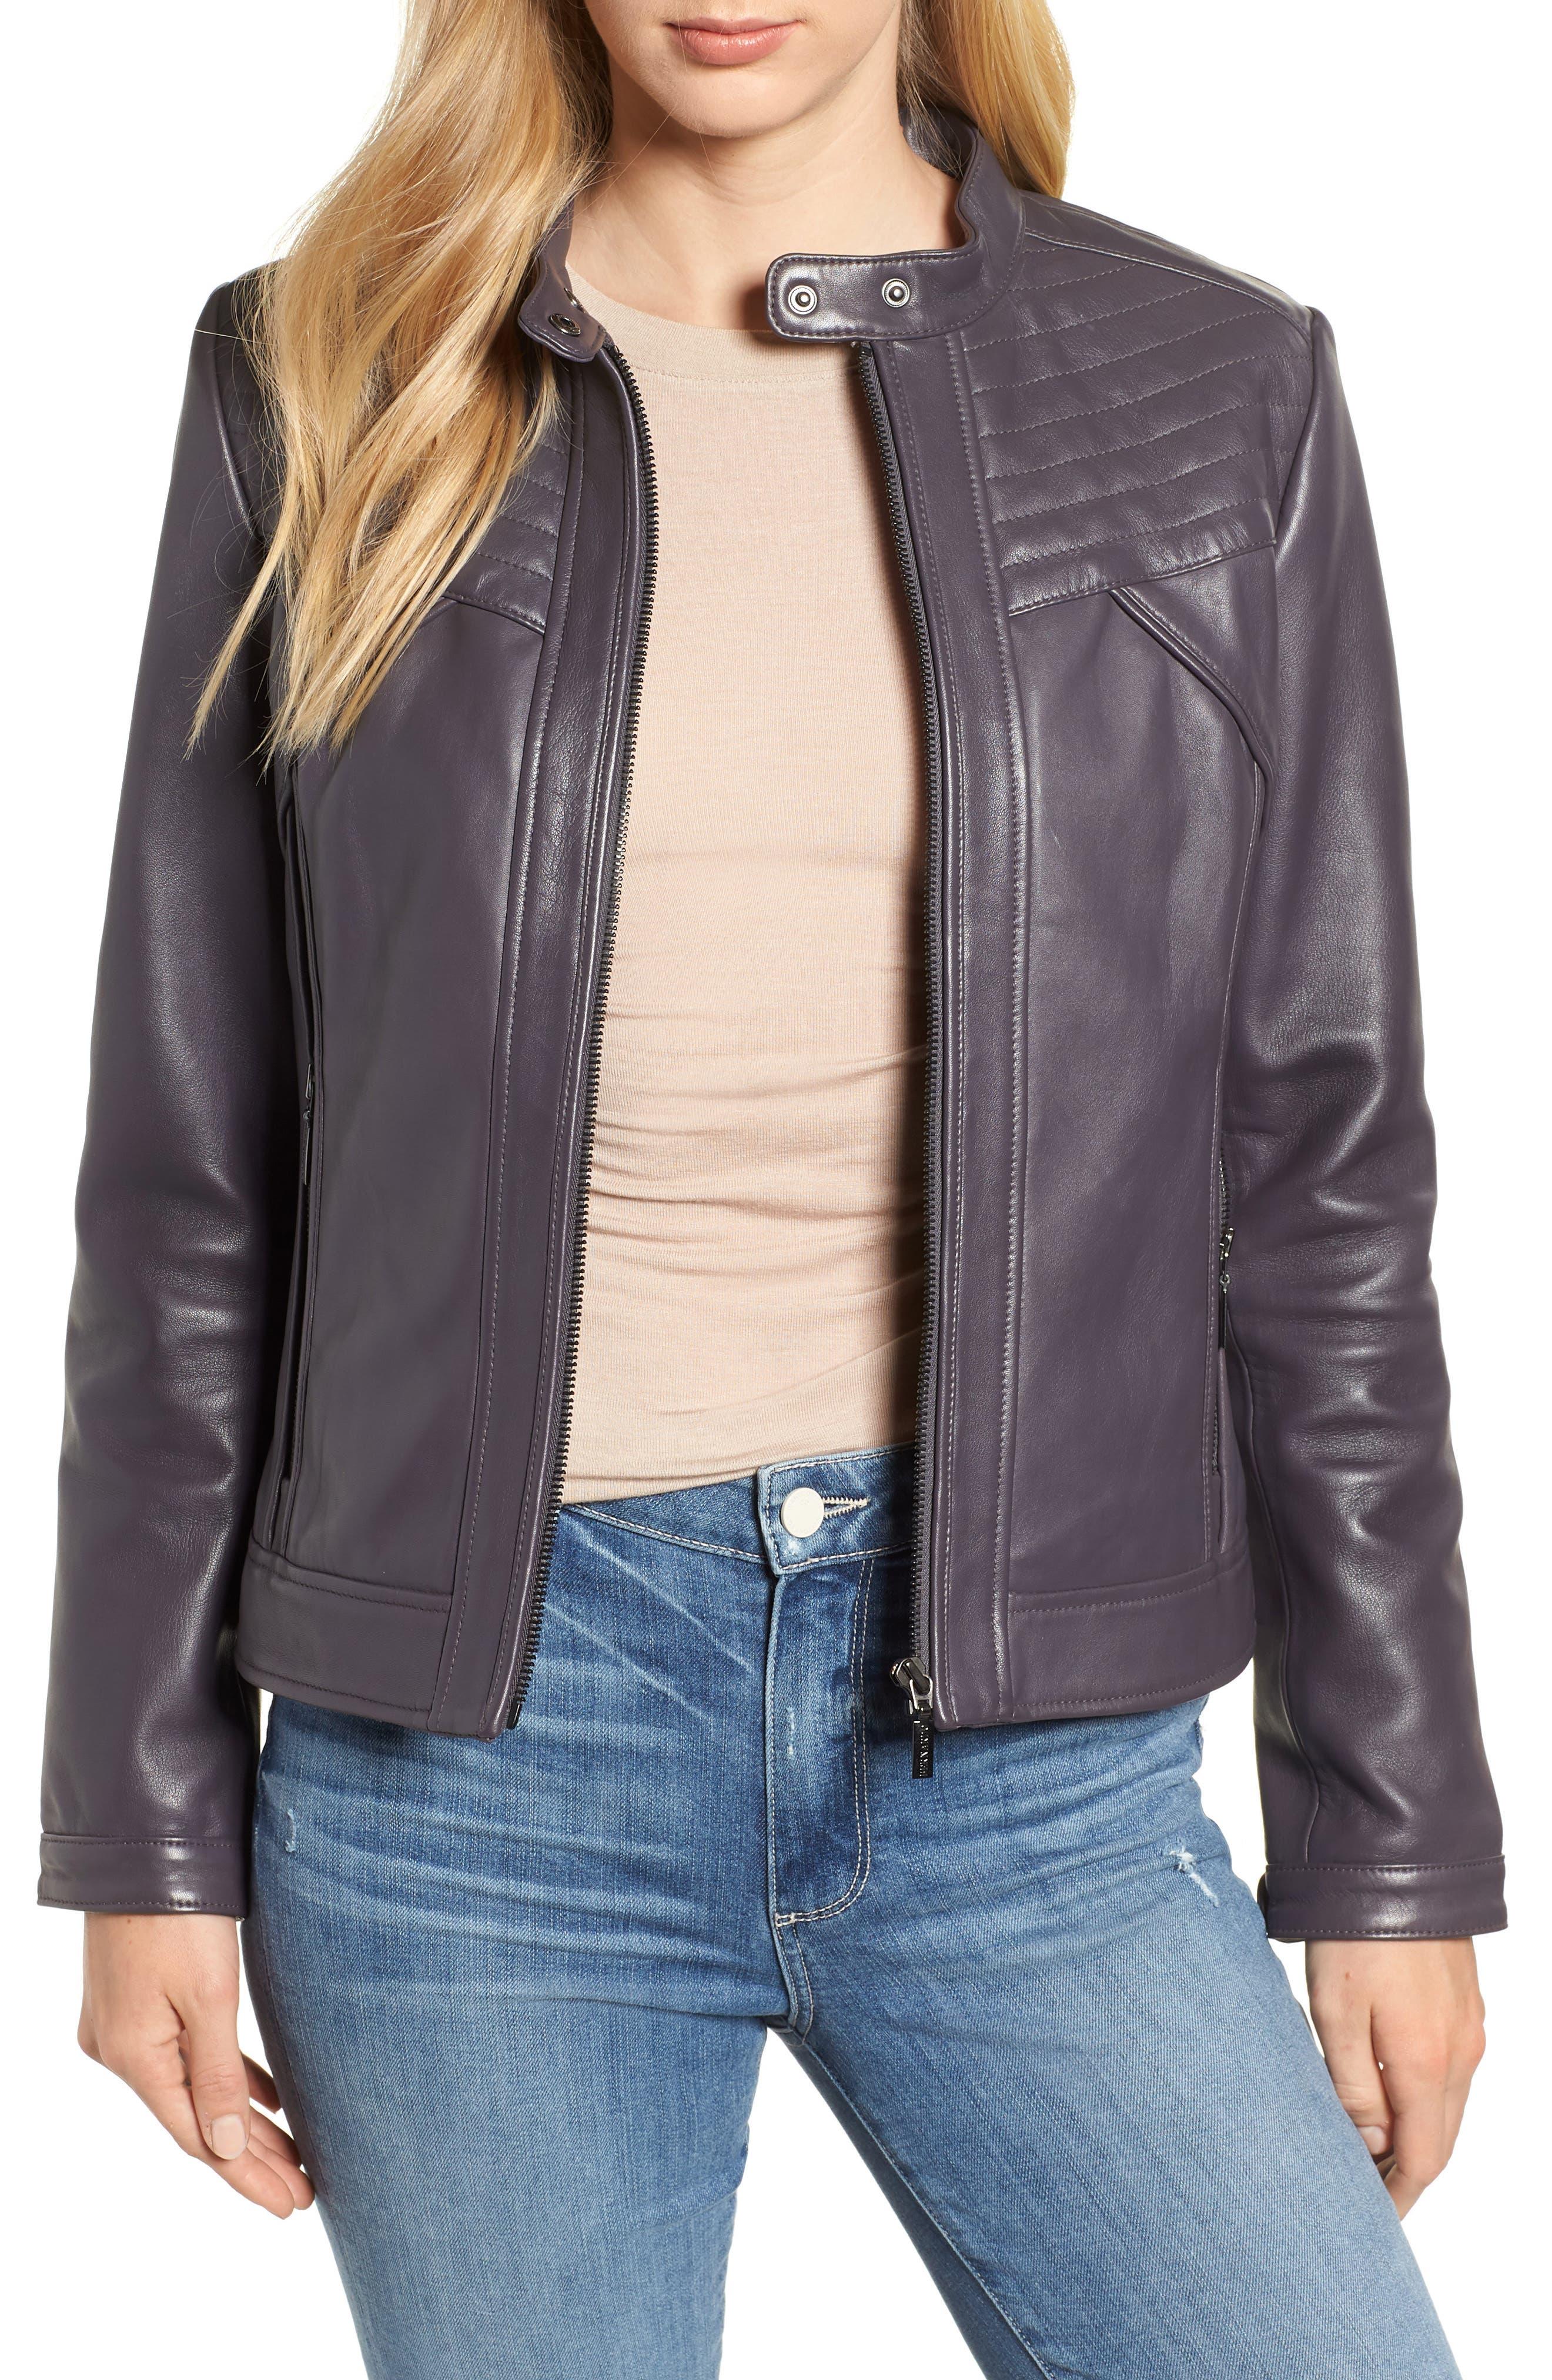 BERNARDO Stitched Leather Jacket in Midnight